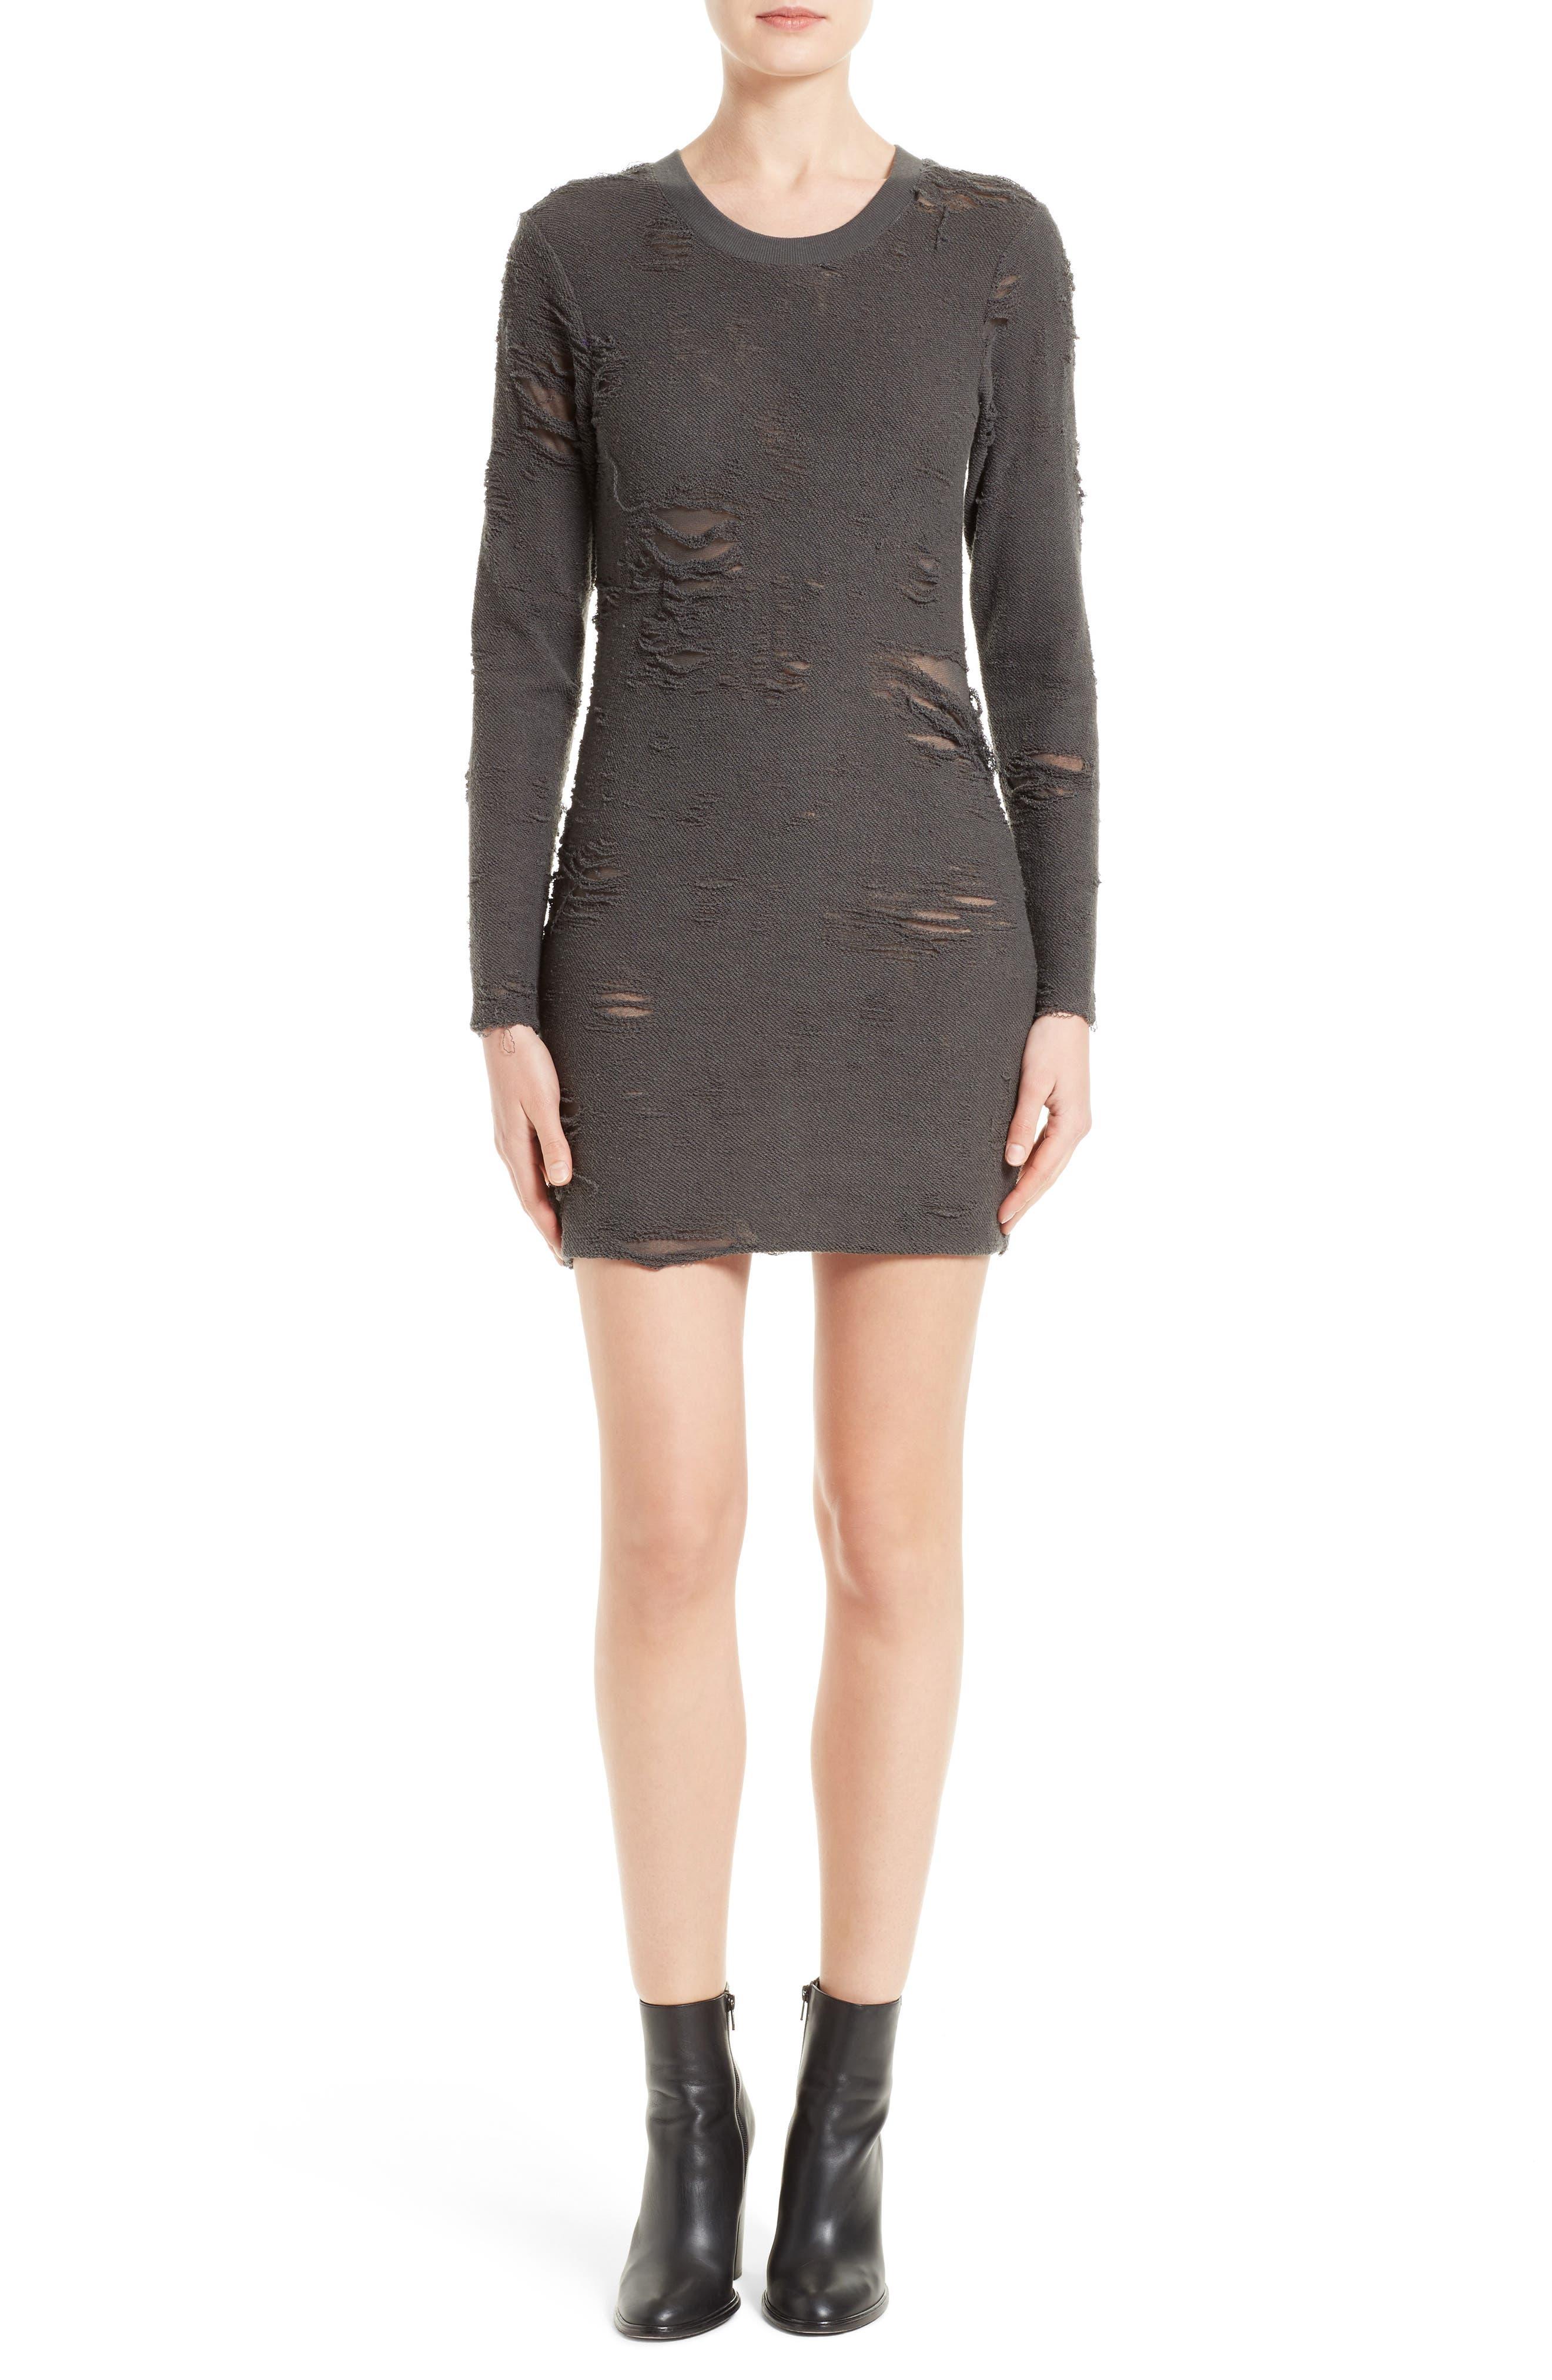 Alternate Image 1 Selected - IRO Cevoc Distressed Dress